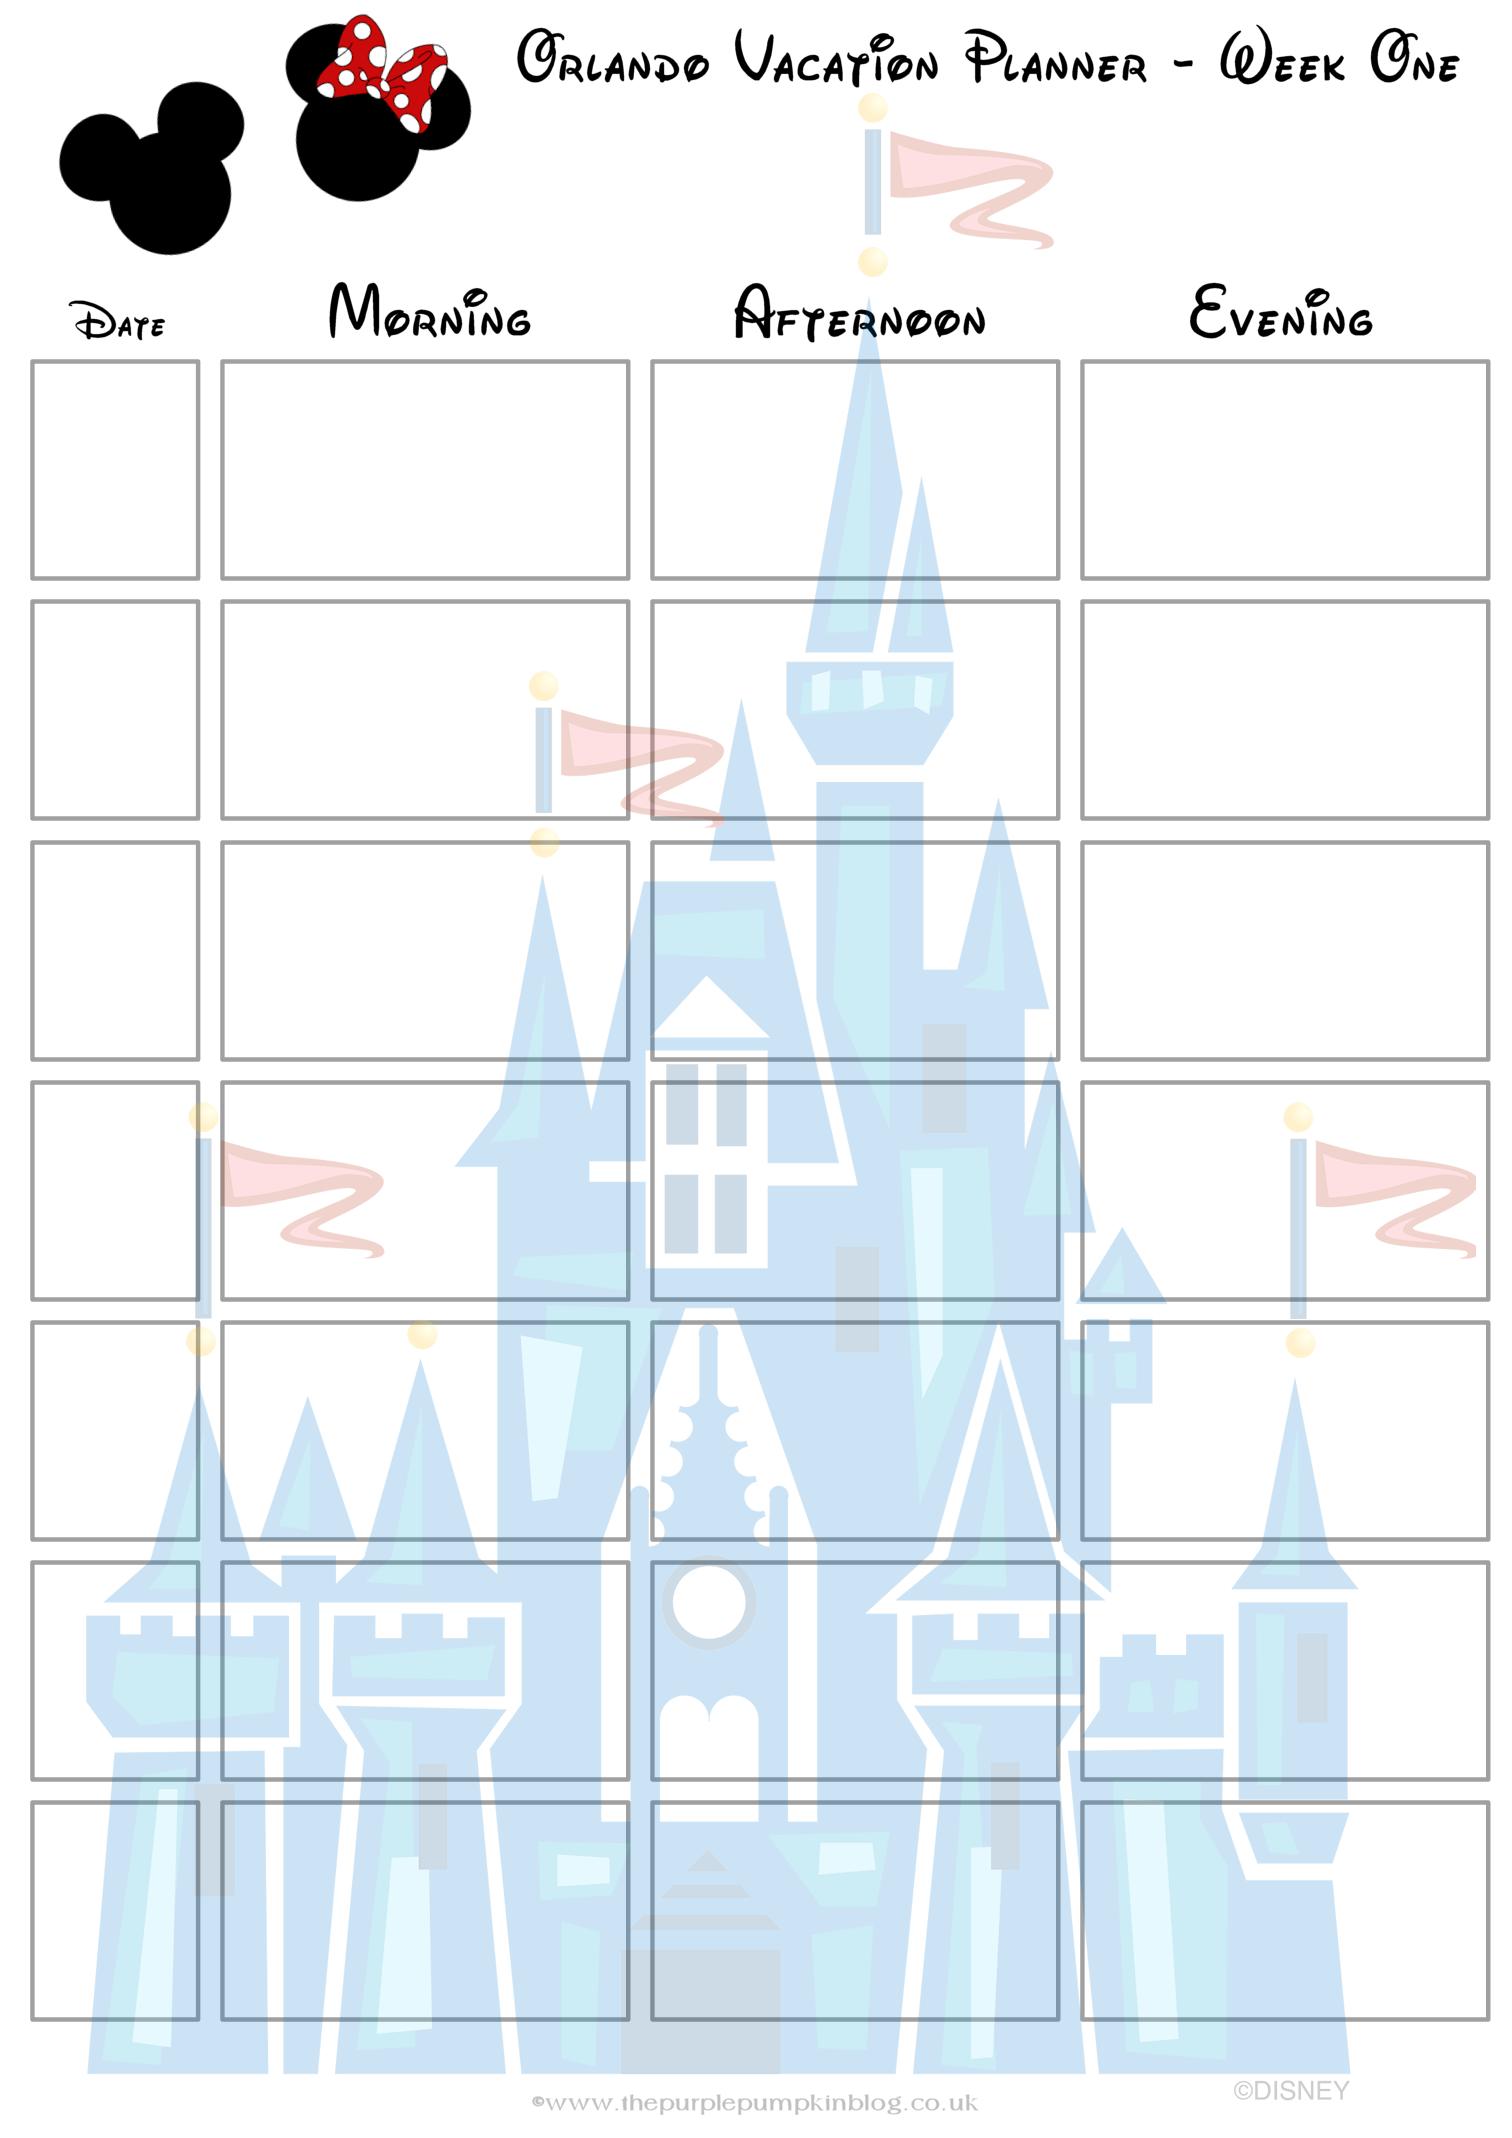 Orlando Walt Disney World Vacation Planner